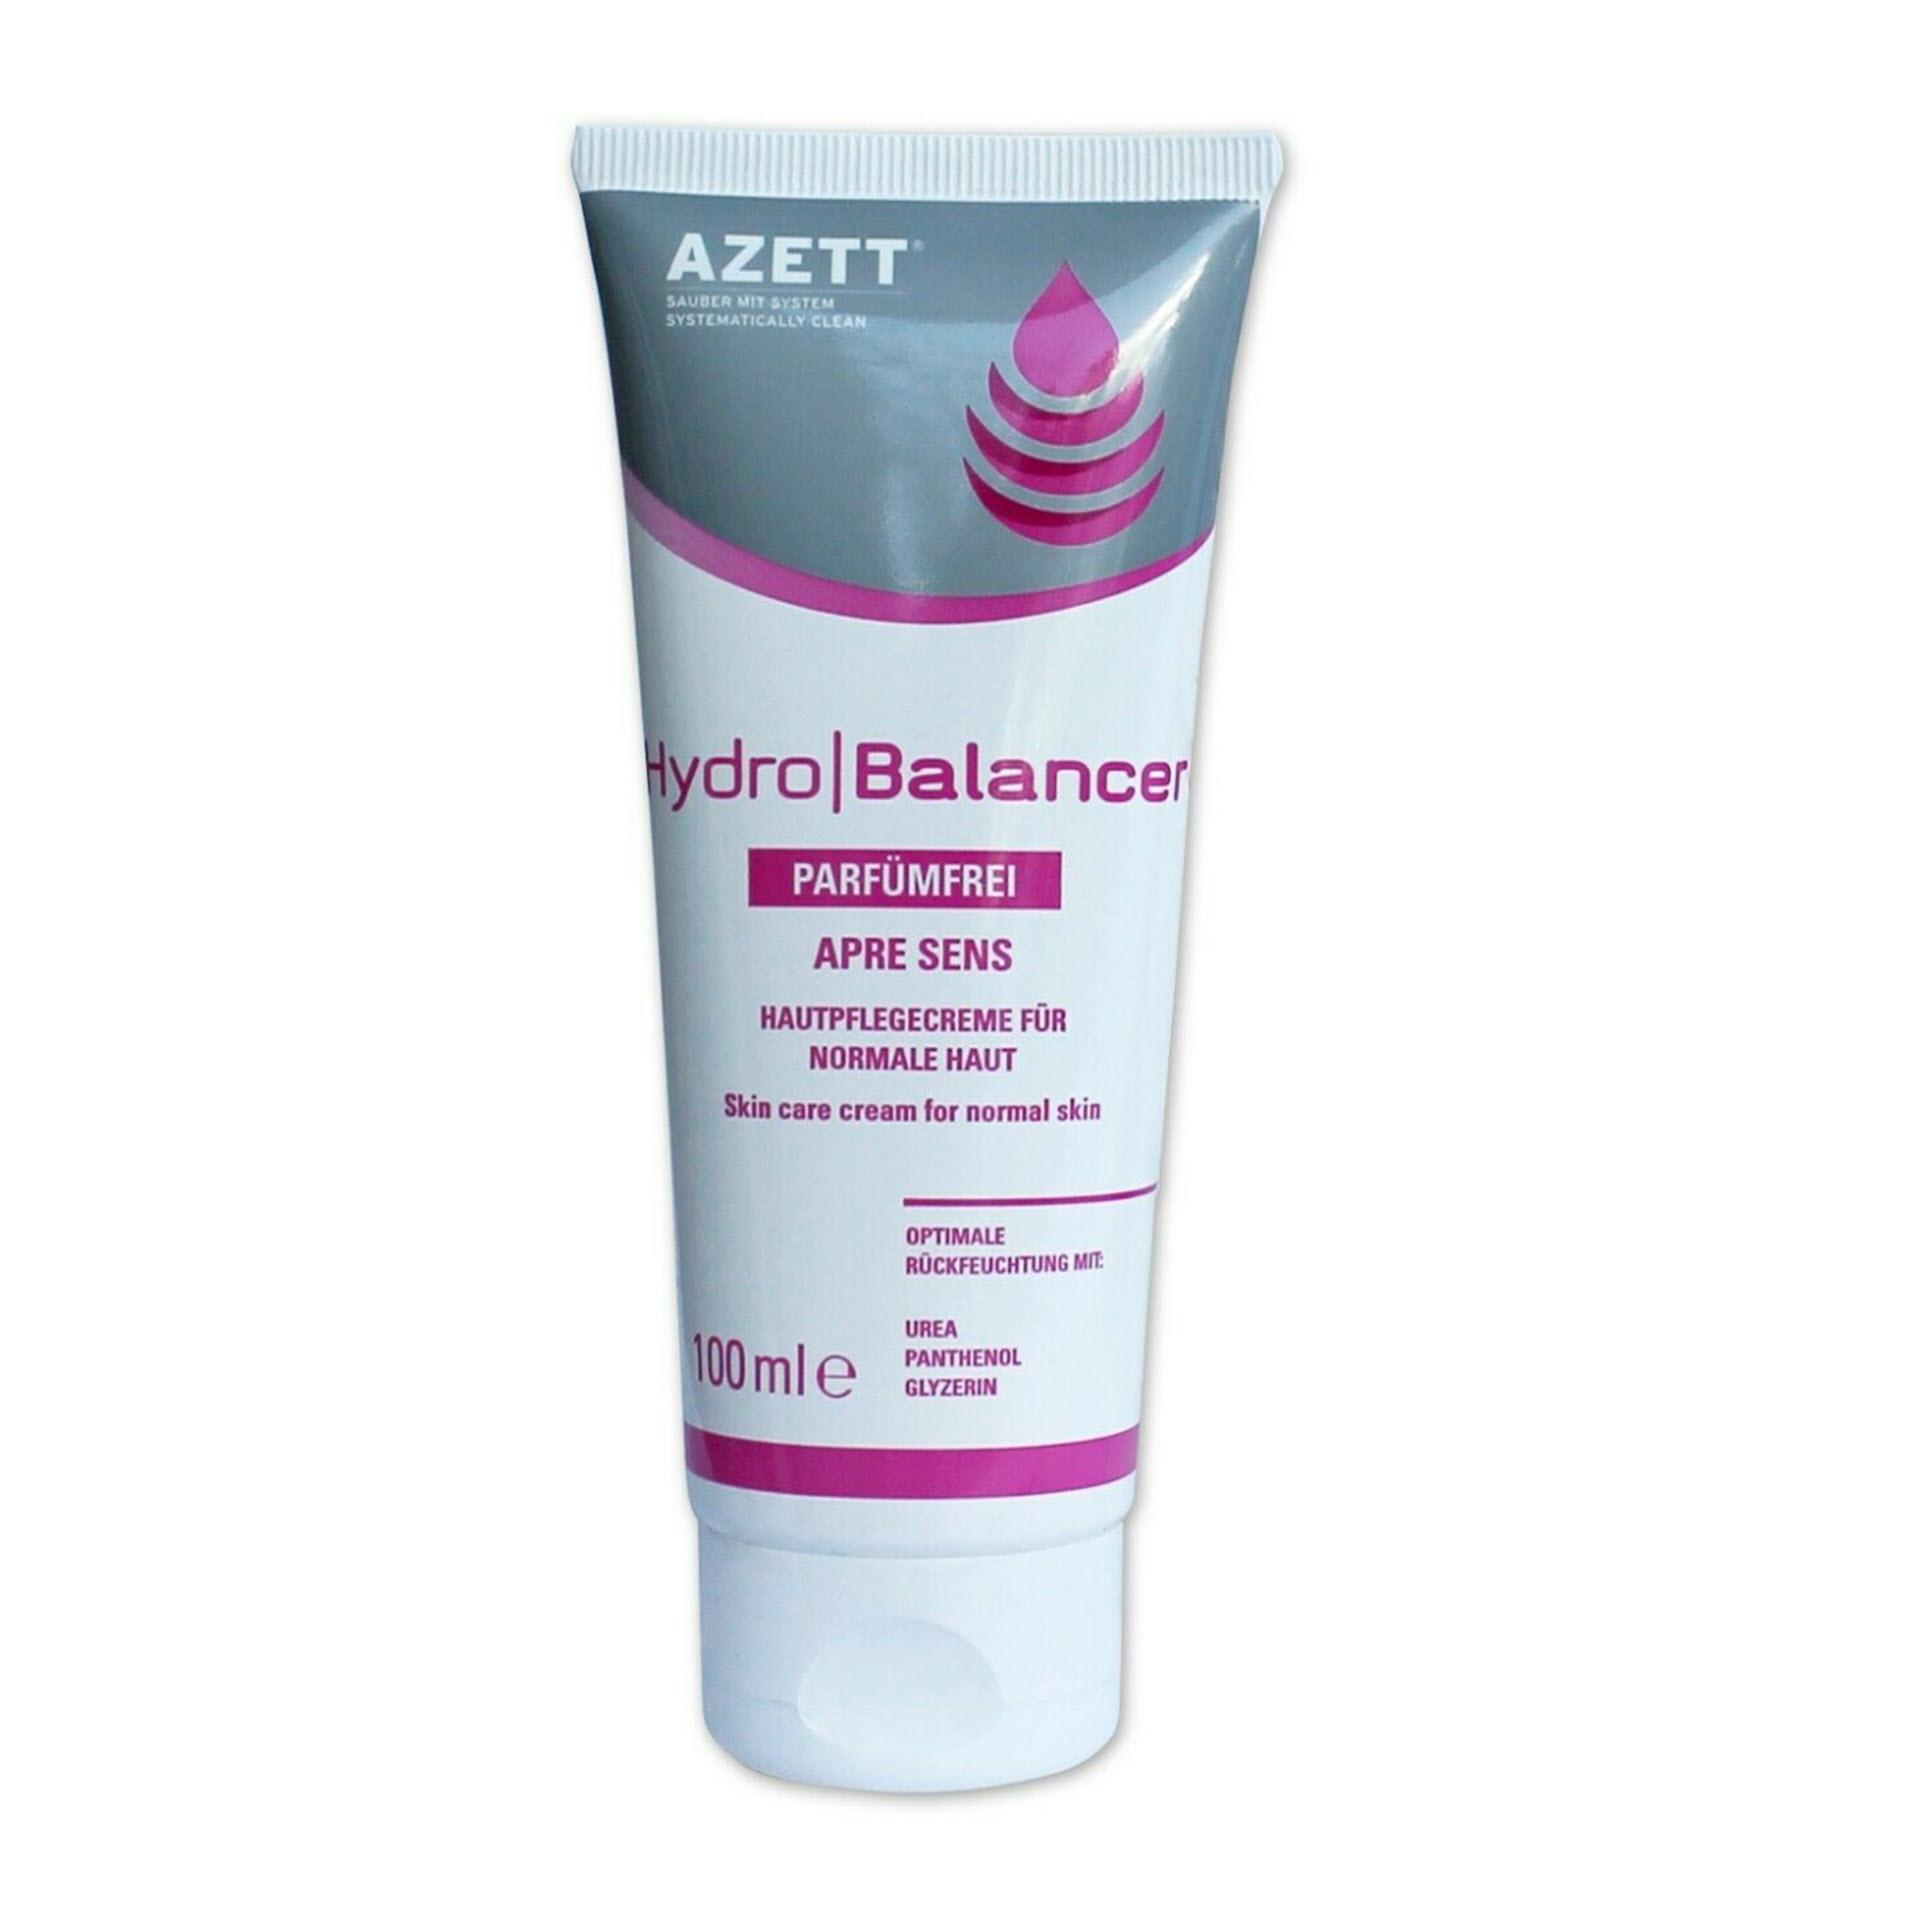 Azett Hydrobalancer / Apre Sens Hautpflegecreme - 100 ml Tube - 915000010